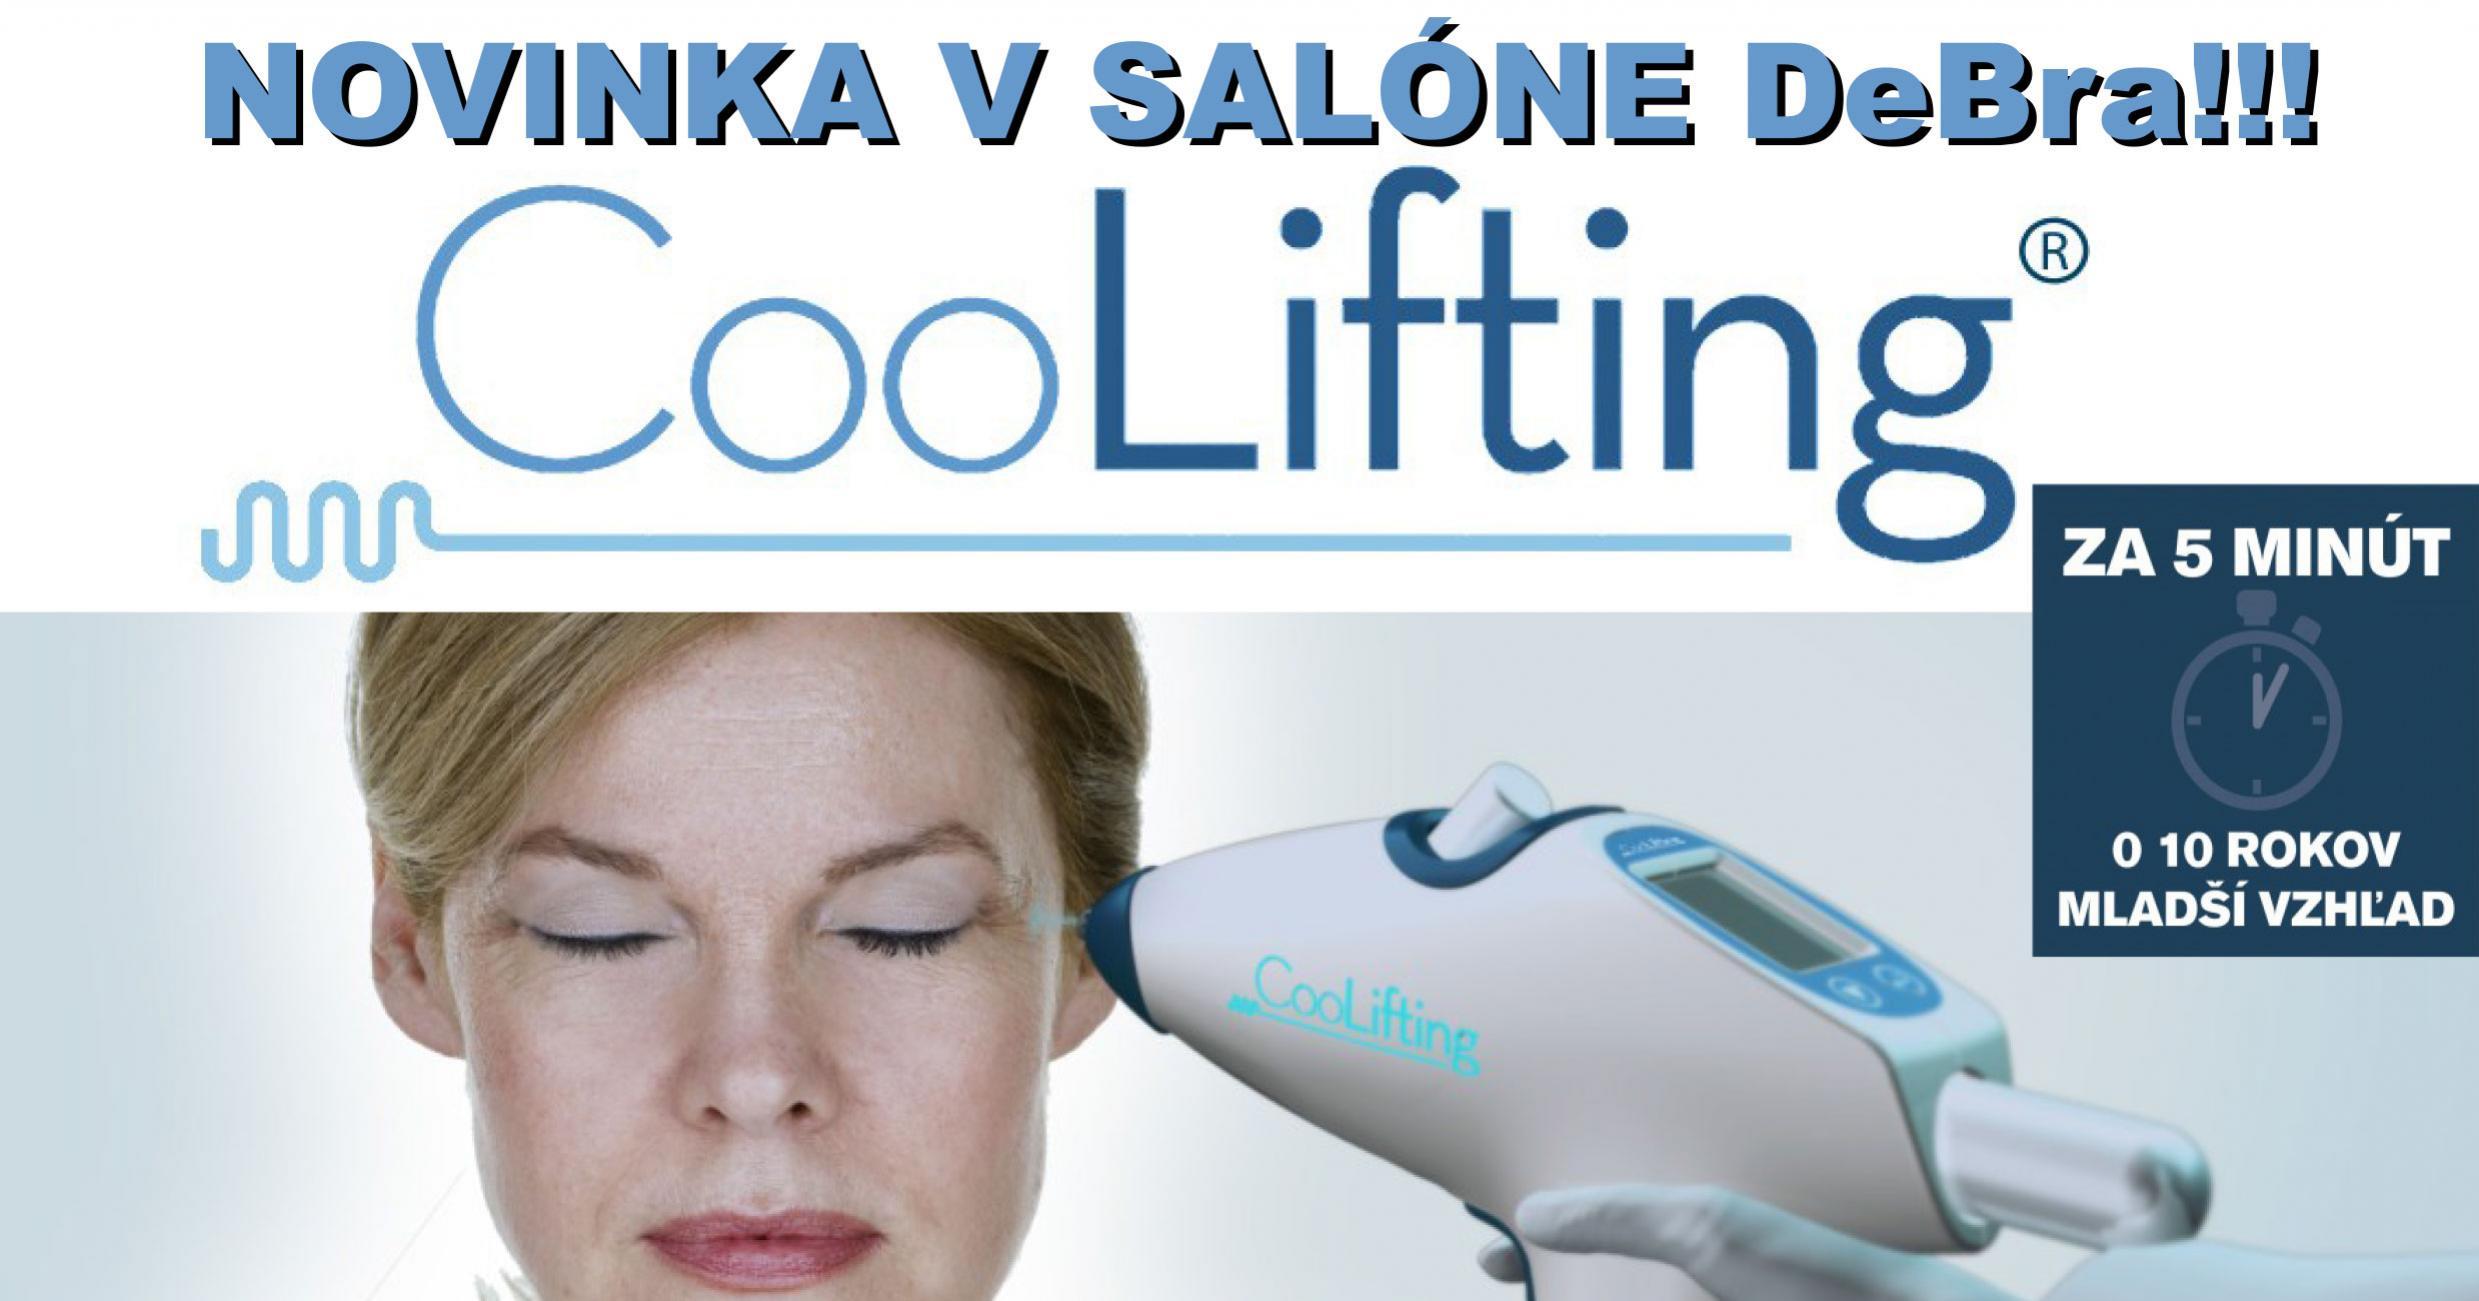 COOLifting salon debra nitra